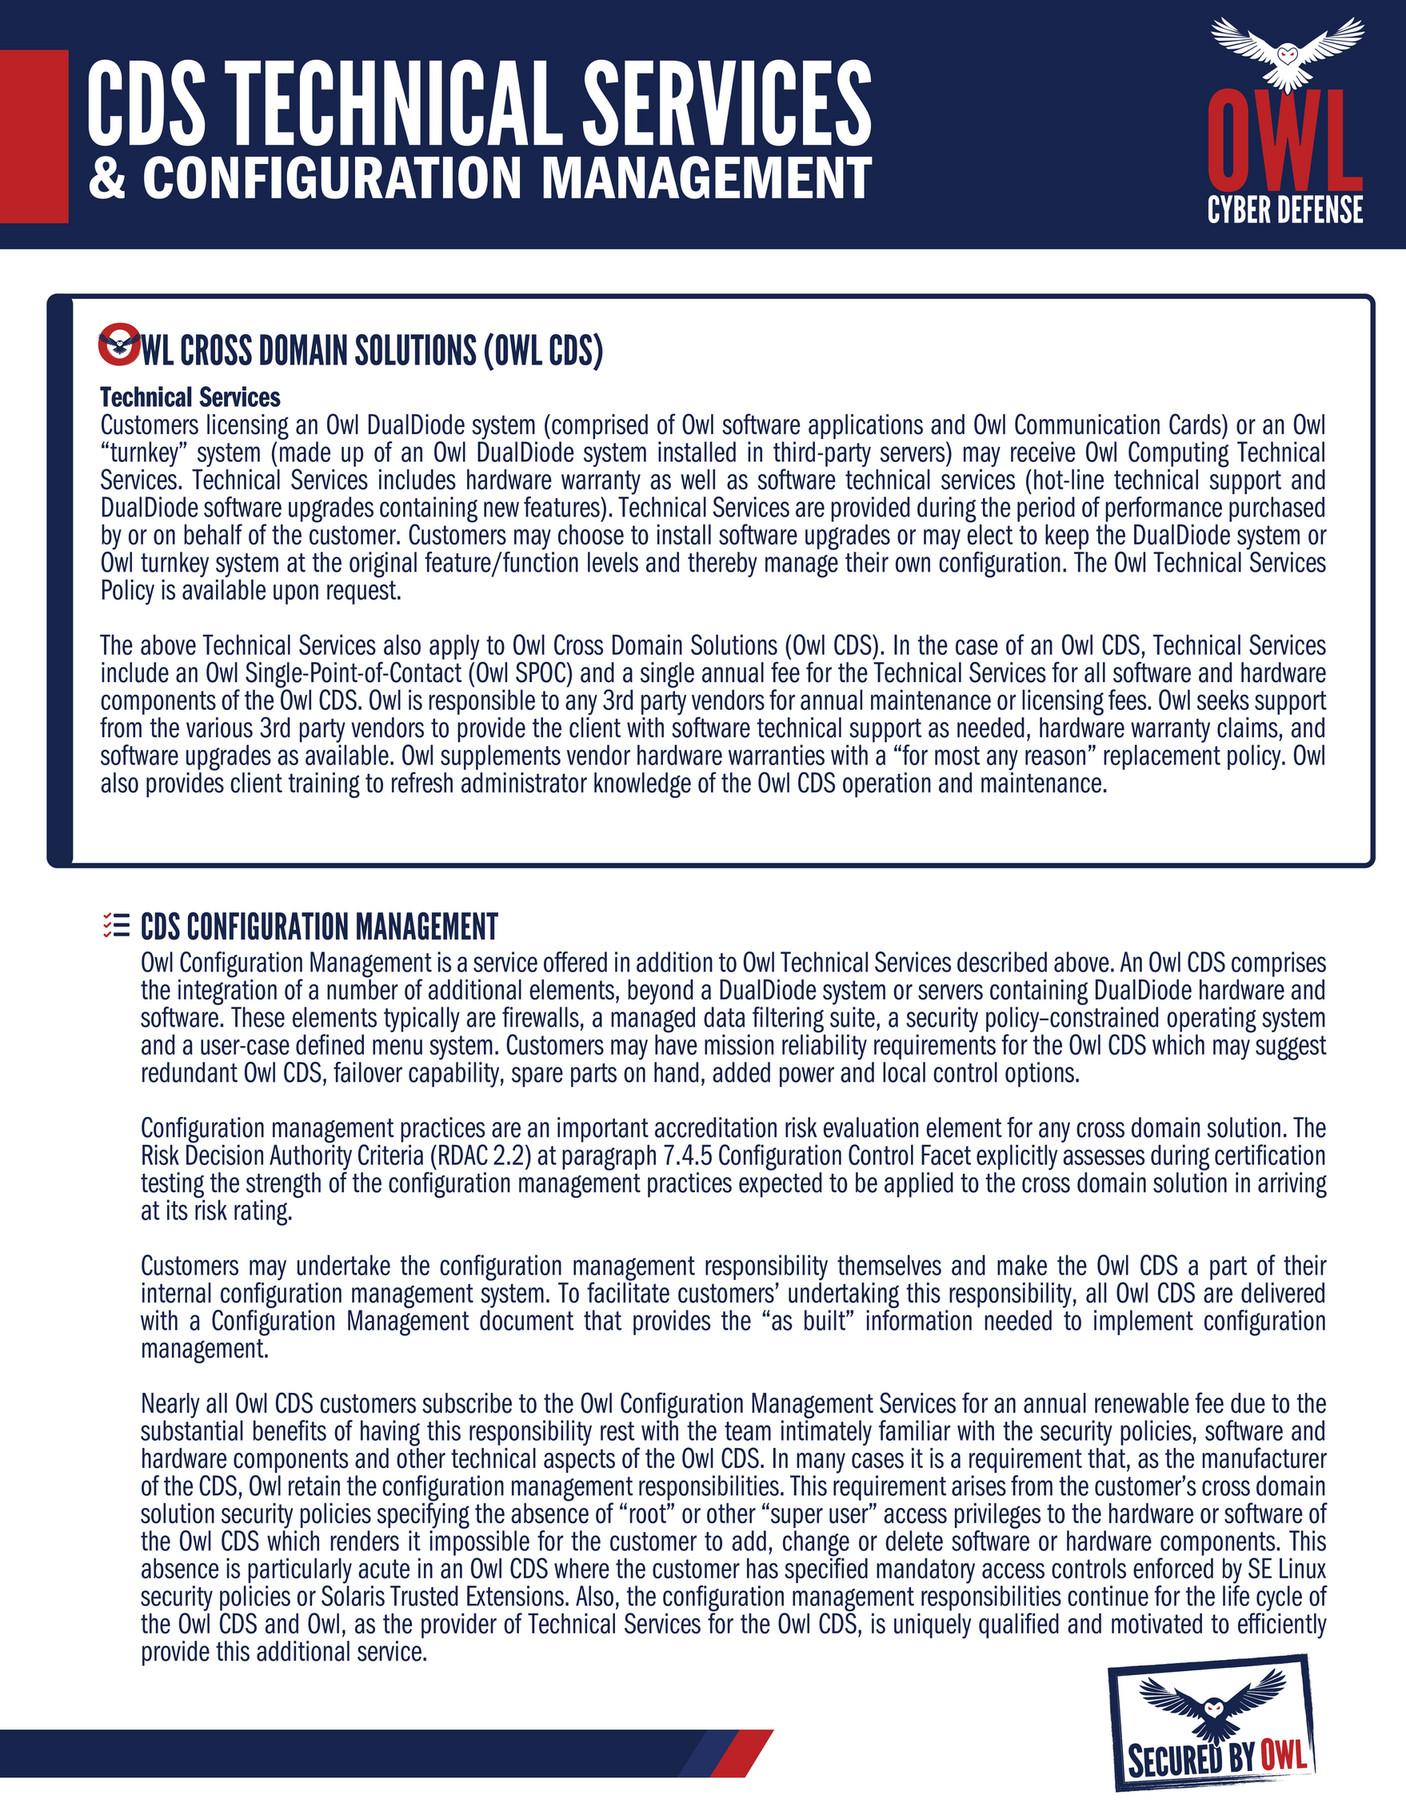 Owl Cyber Defense Services Configuration Management Page 2